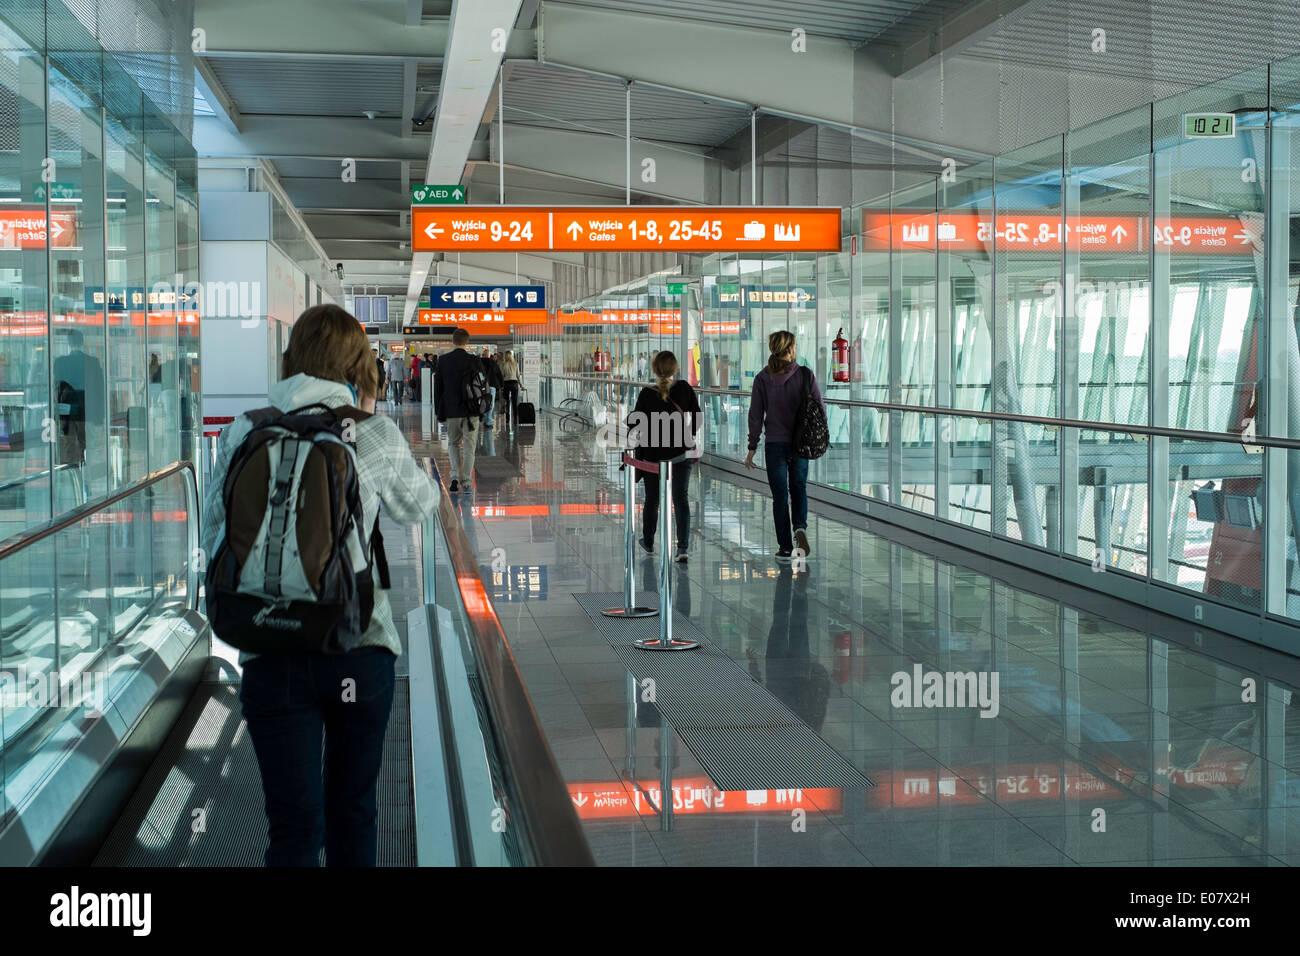 Aeroporto Waw : Modern chopin airport warsaw poland stock photo: 69015593 alamy